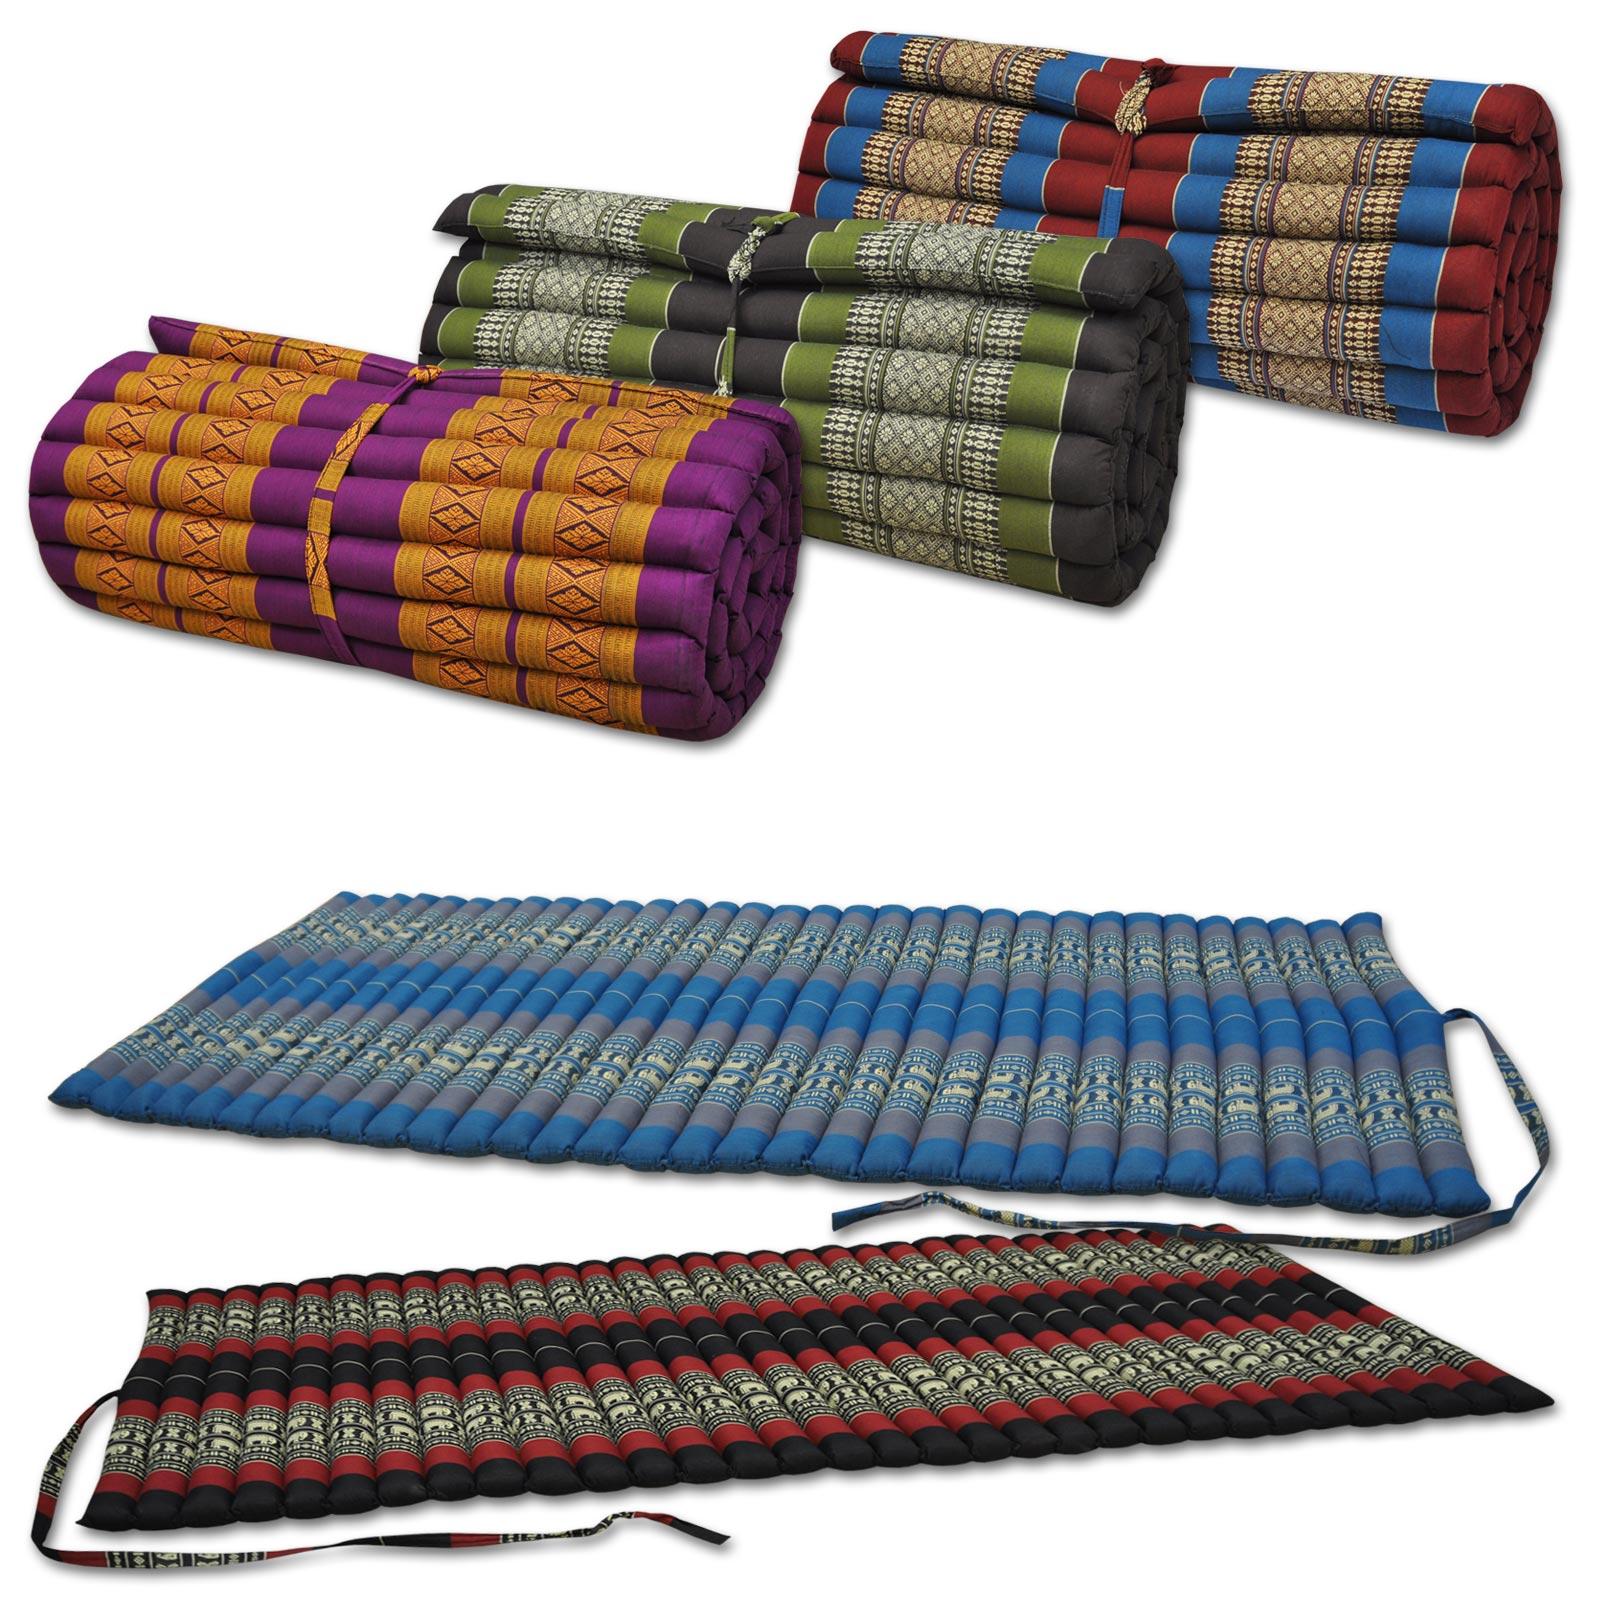 Rolling mattress